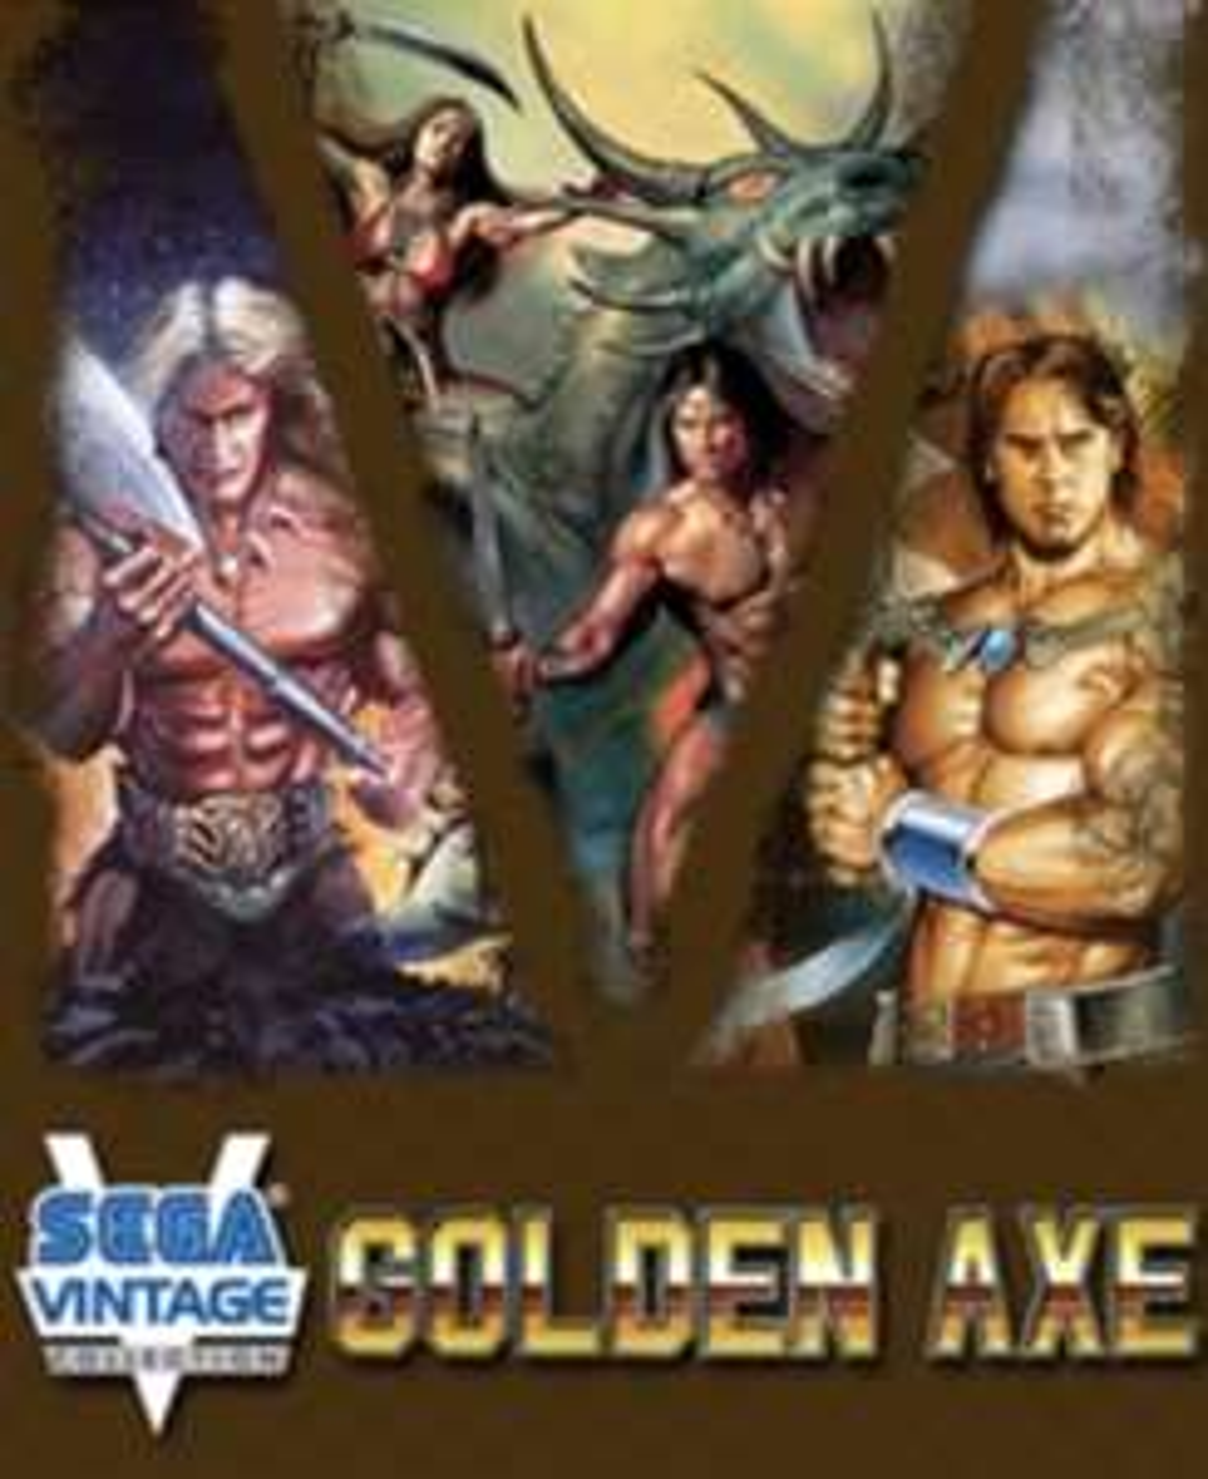 Sega Vintage Collection: Golden Axe (Xbox one/Xbox 360) £3.37 with gold @ Microsoft store